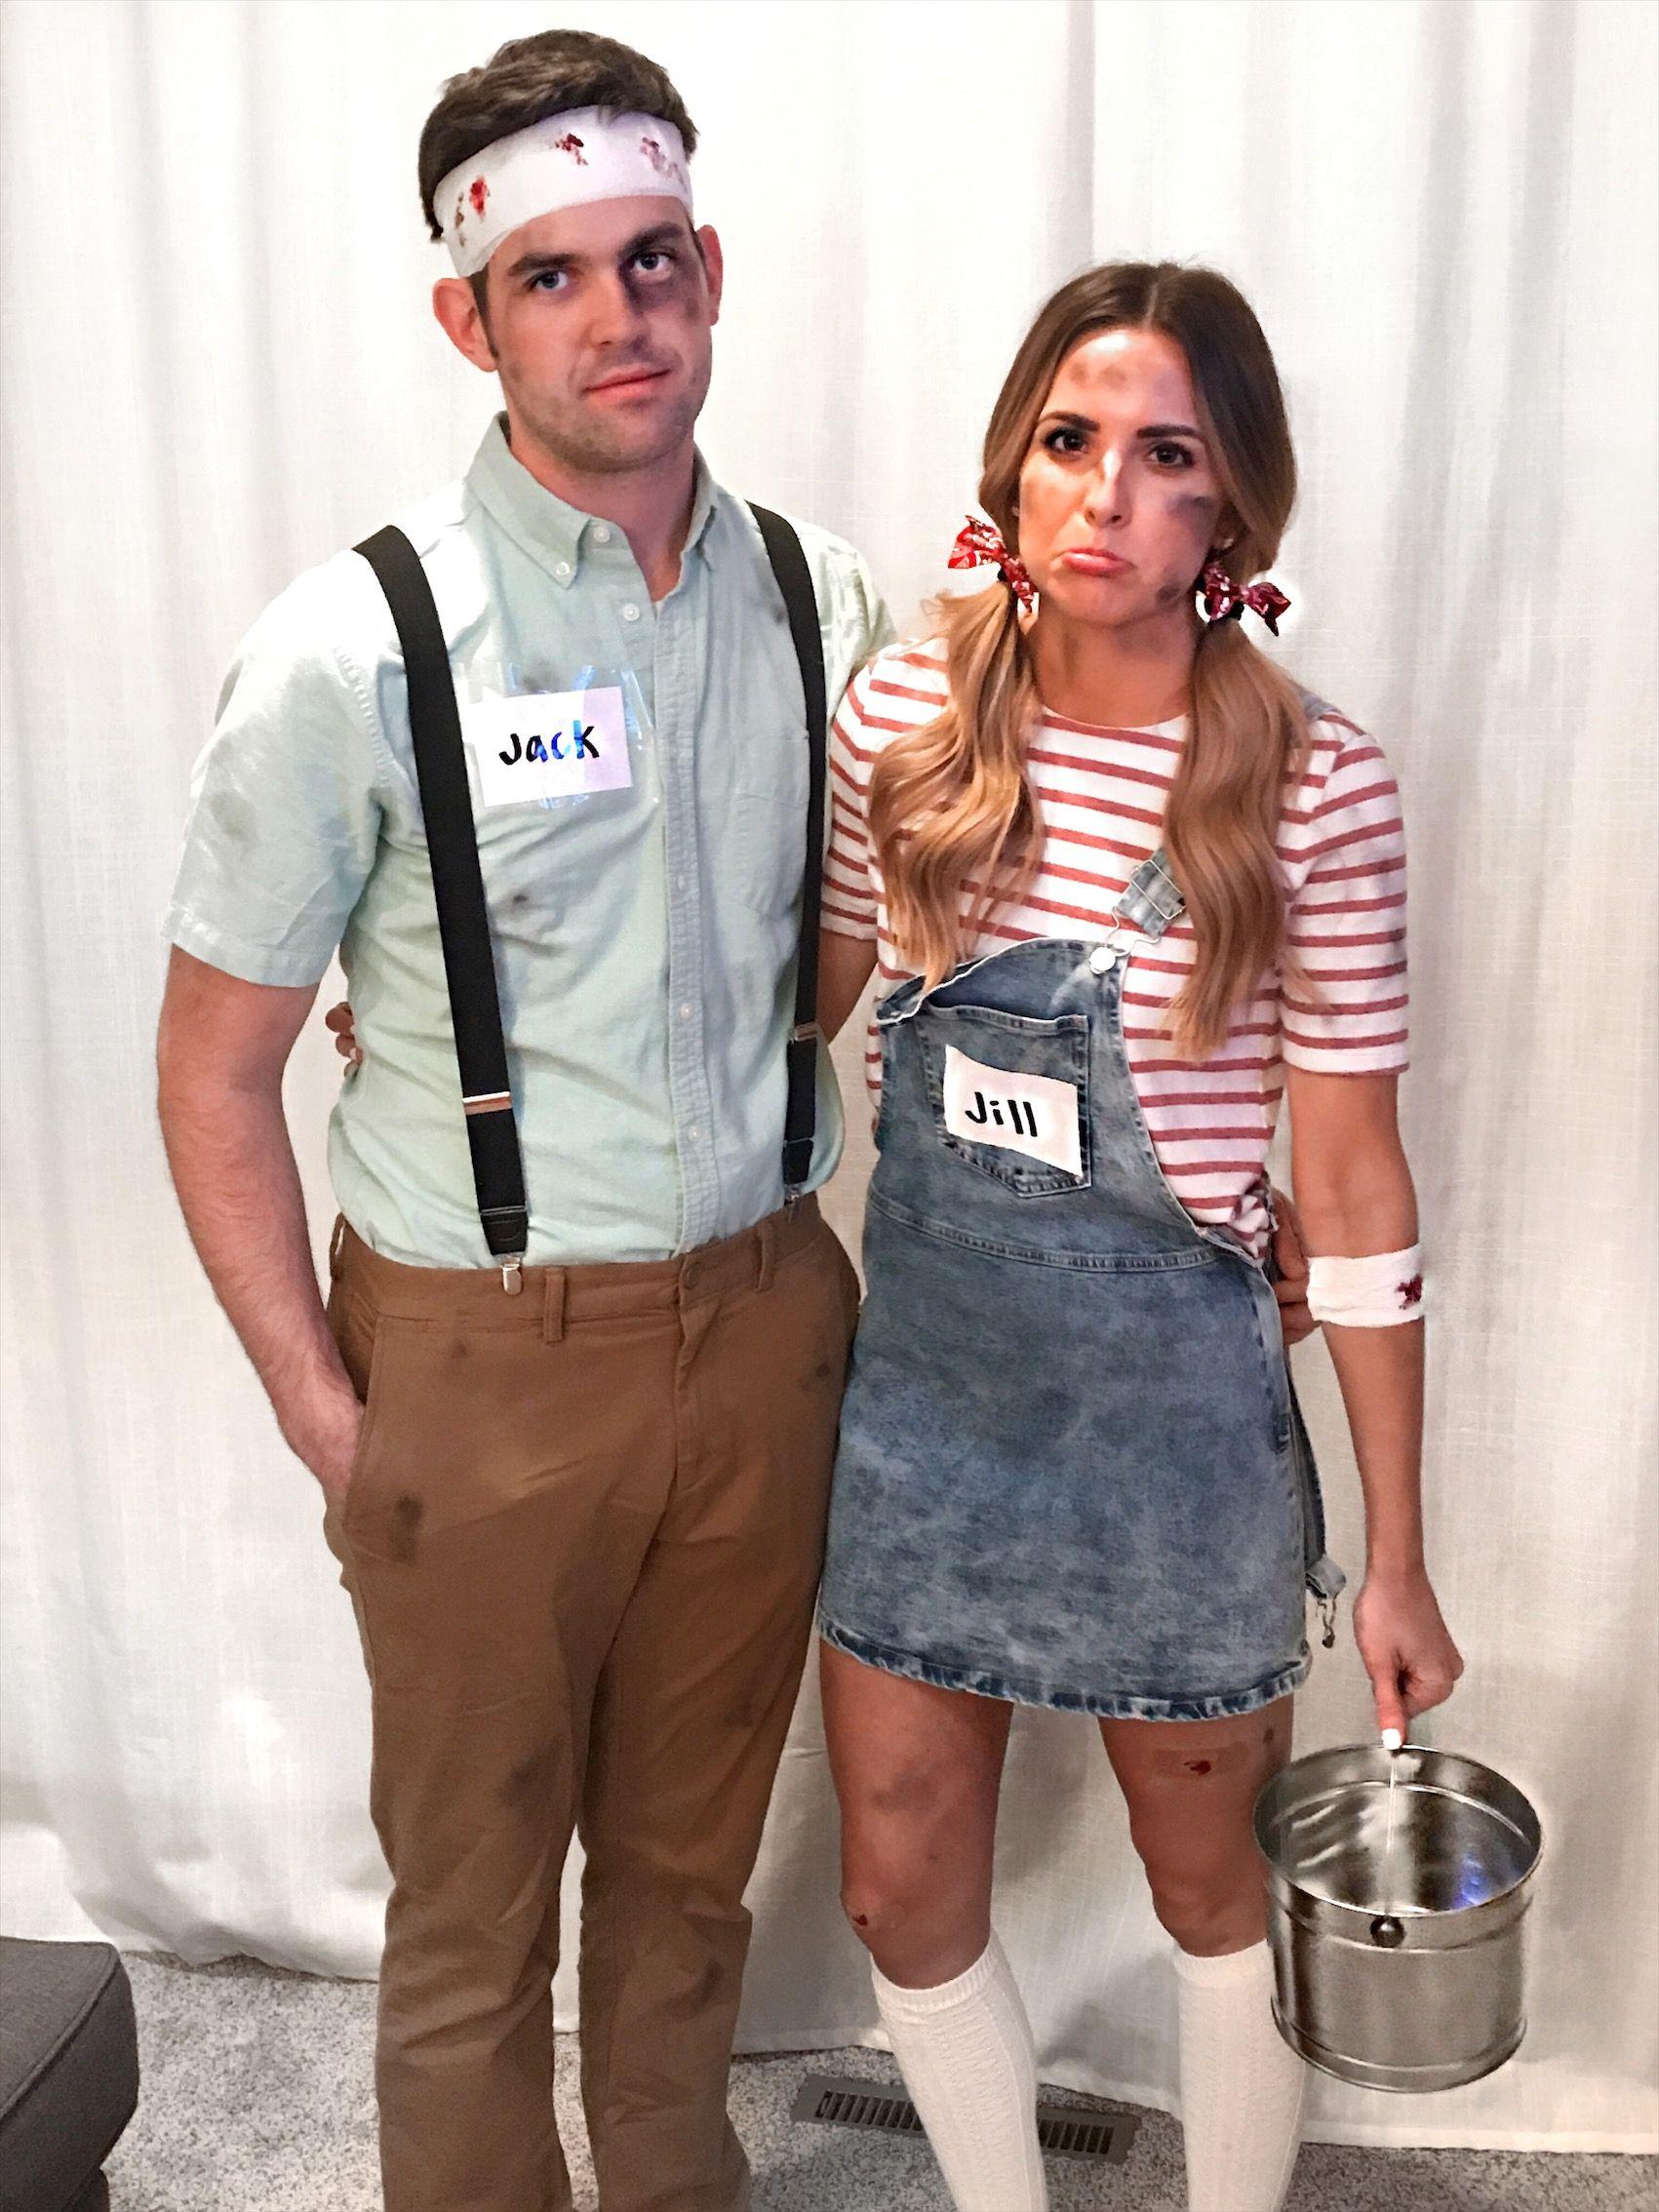 Jack and jill easy halloween costume couples costume diy jack and jill easy halloween costume couples costume diy last minute solutioingenieria Gallery